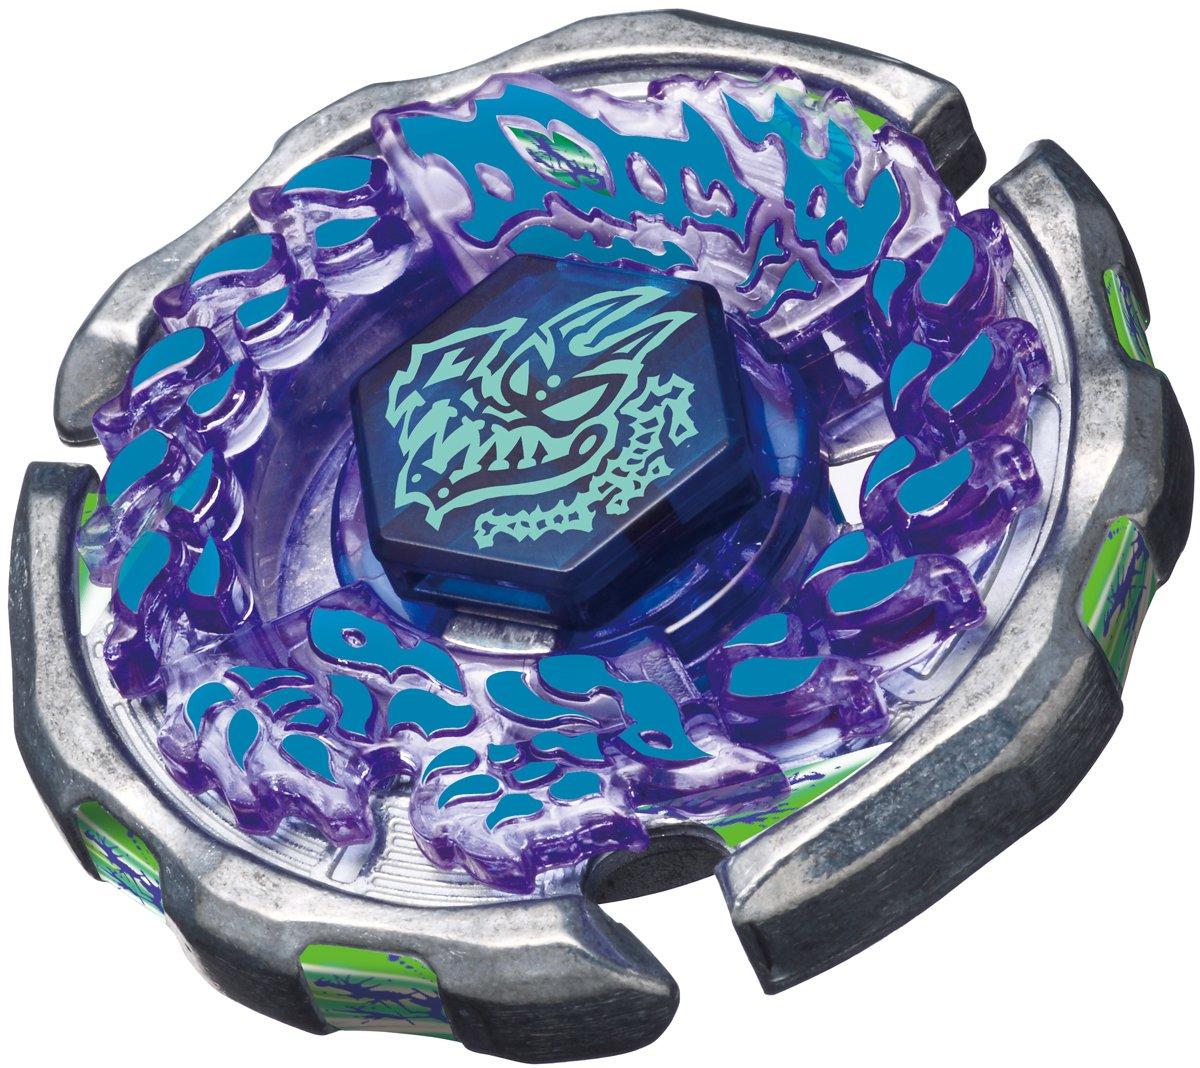 Unbekannt TakaraTomy Kreisel # BB91Japanische Metall Fusion Booster Ray Gil Battle Top manufacturer Japan VideoGames BB-377399